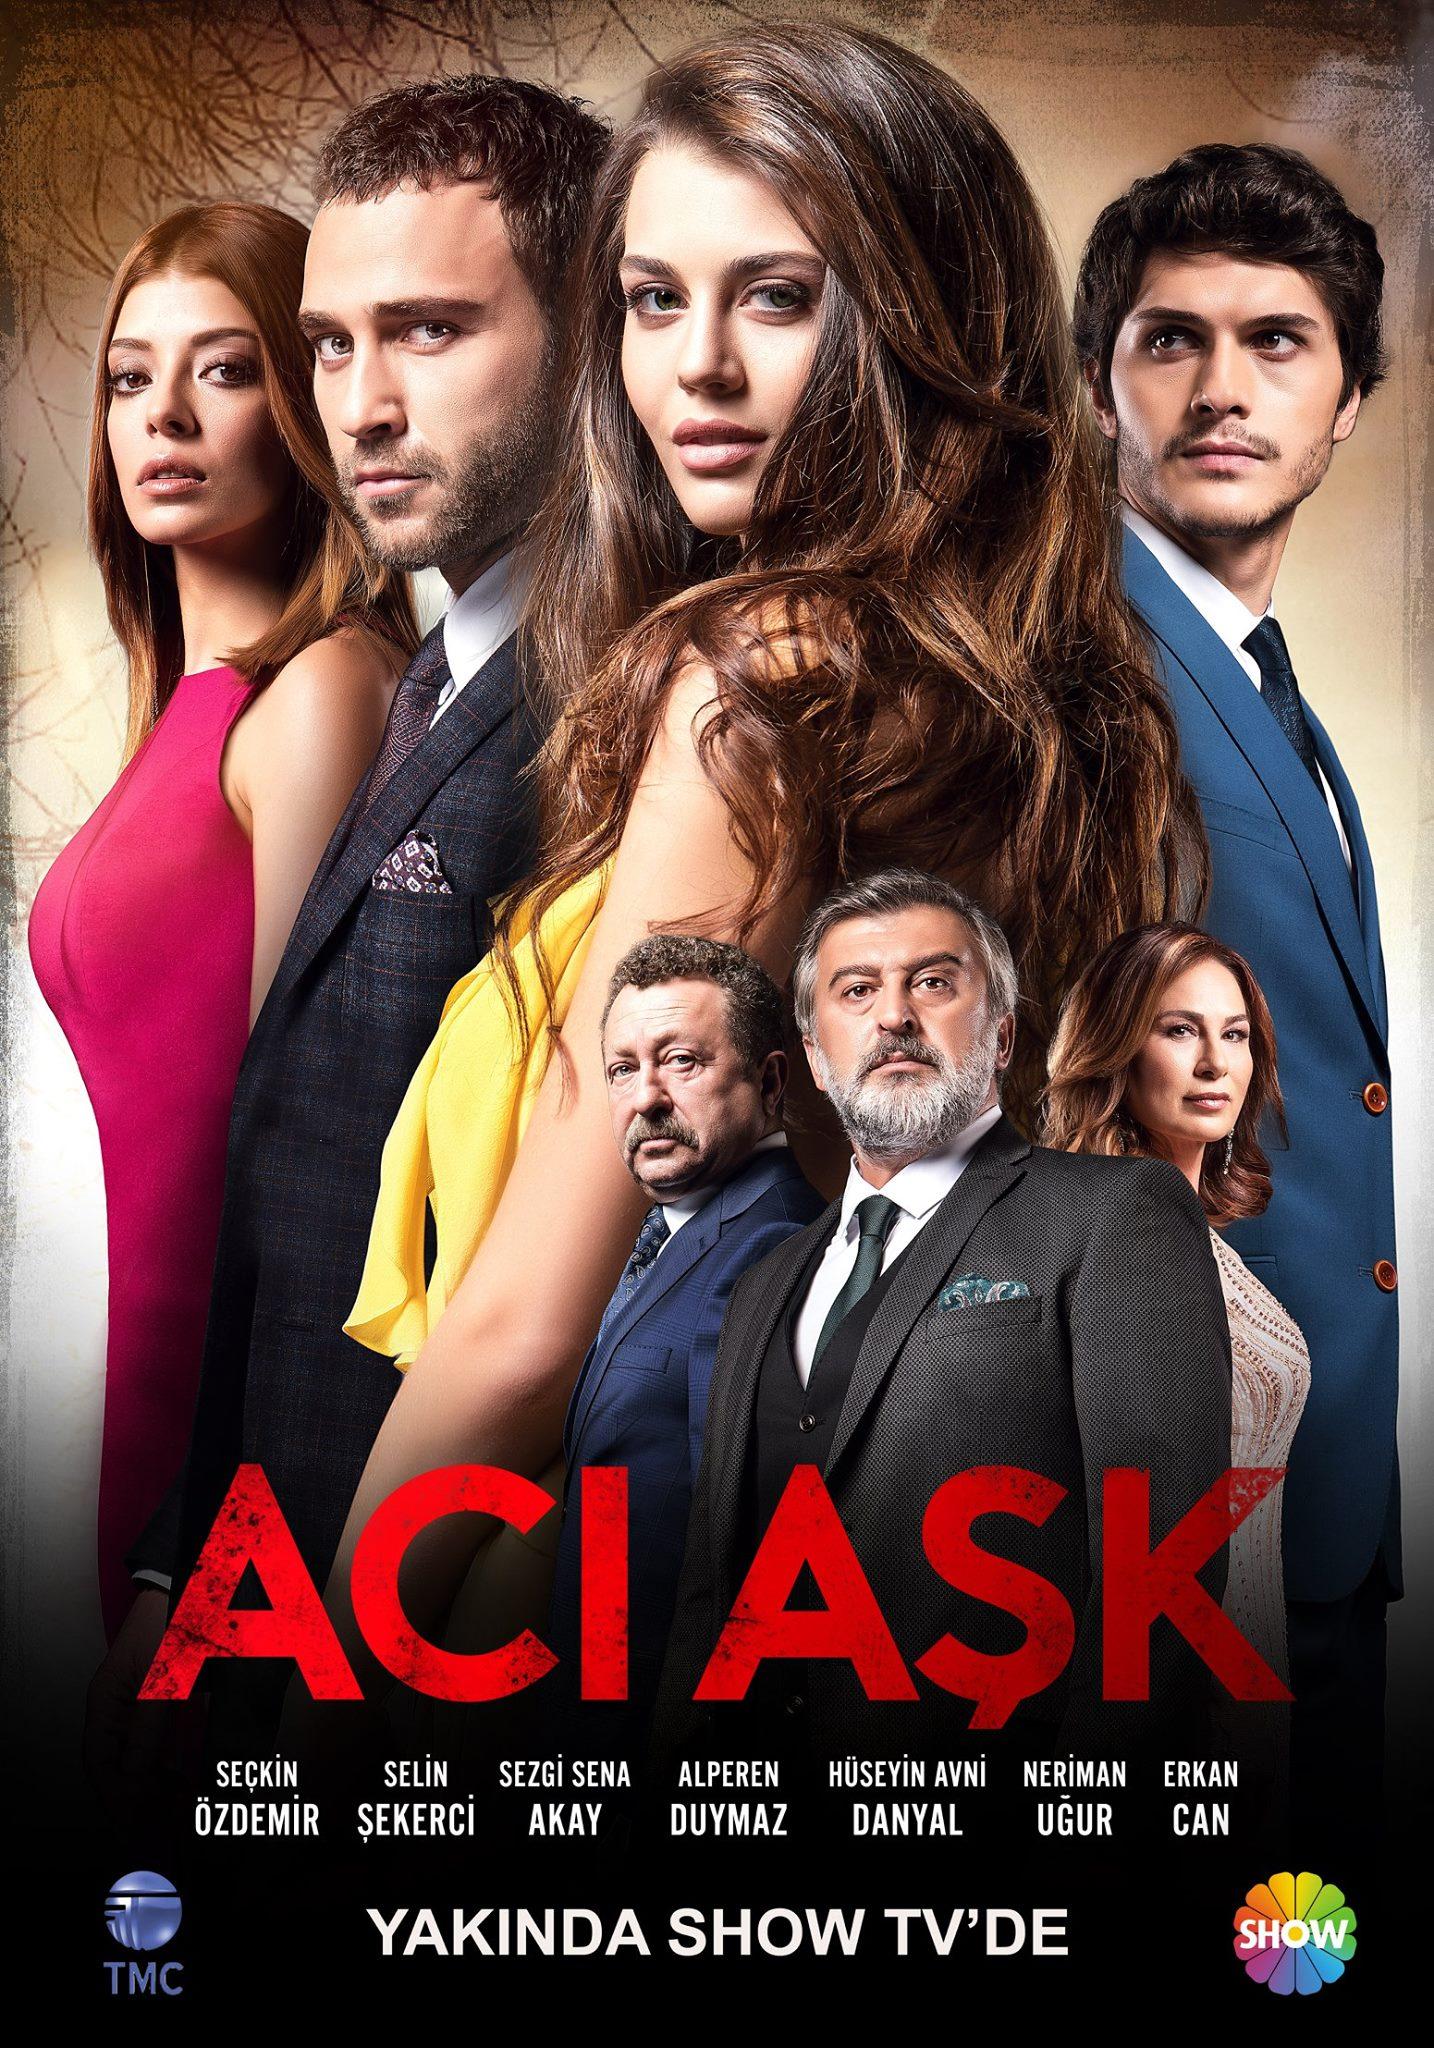 Aci Ask (TV Series 2015–2016) - IMDb